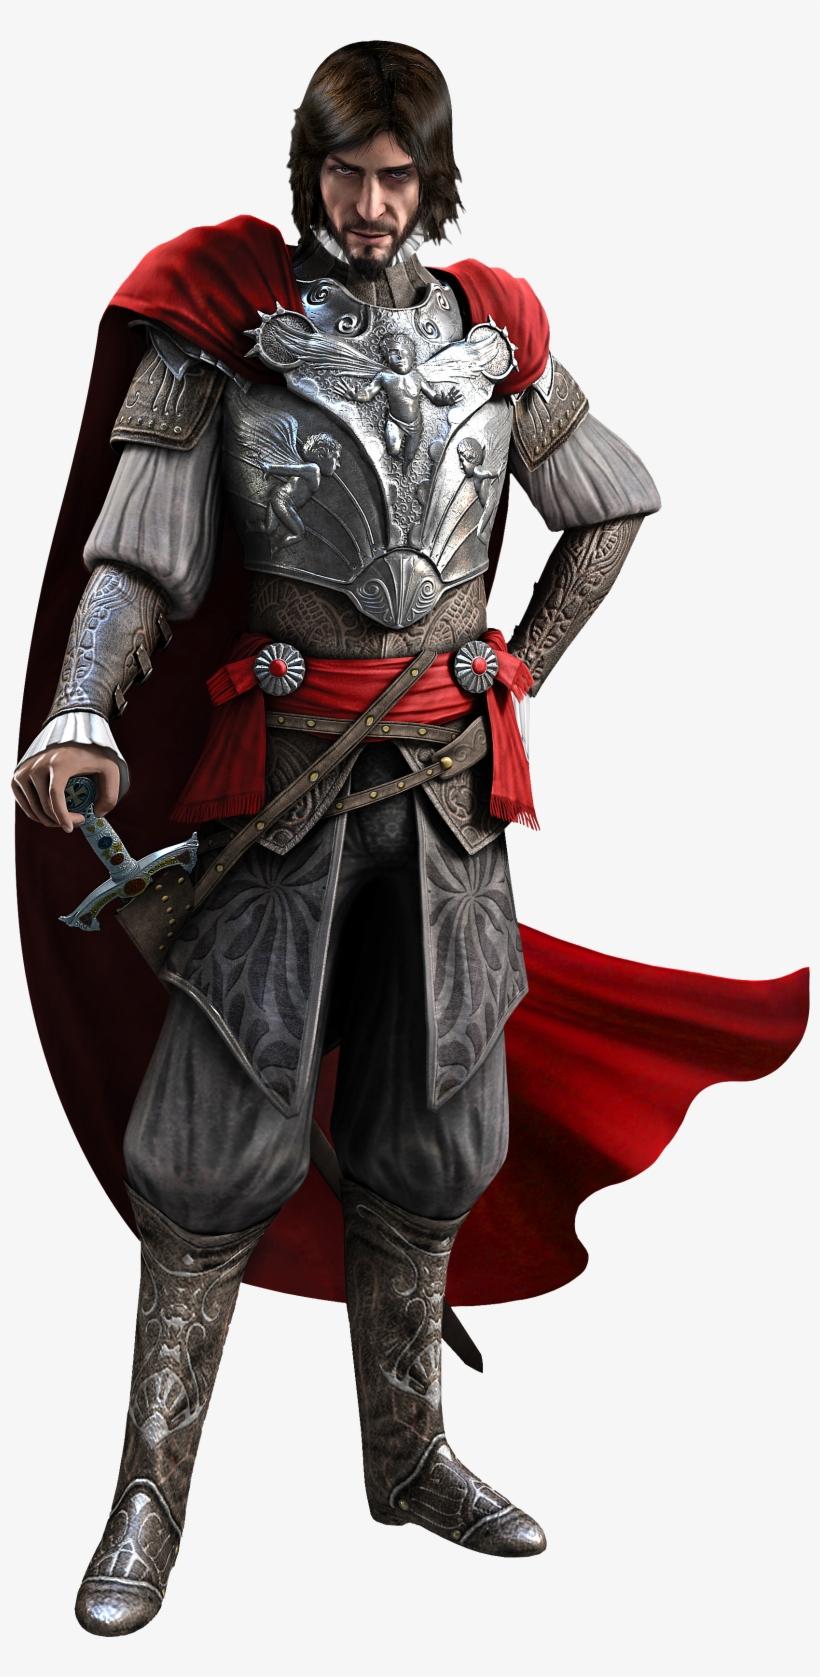 Assassin Creed Syndicate Clipart Render - Assassin's Creed Brotherhood Cesare Borgia, transparent png #503488